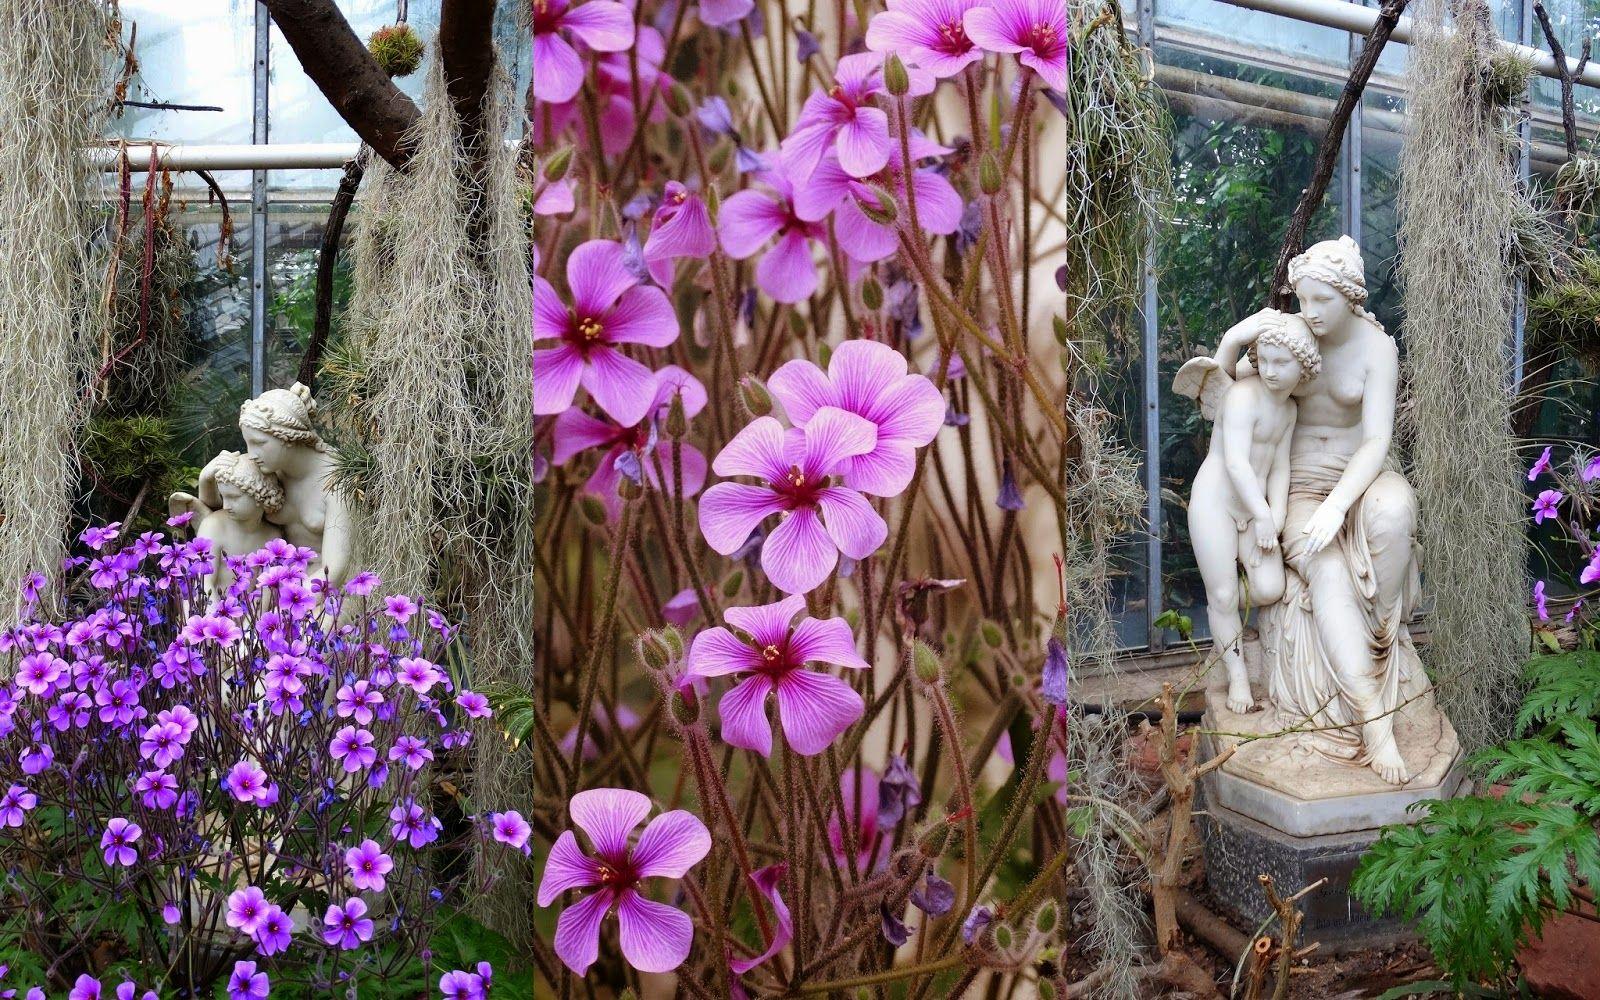 Flora Botanischer Garten Koln With Images Kolonia